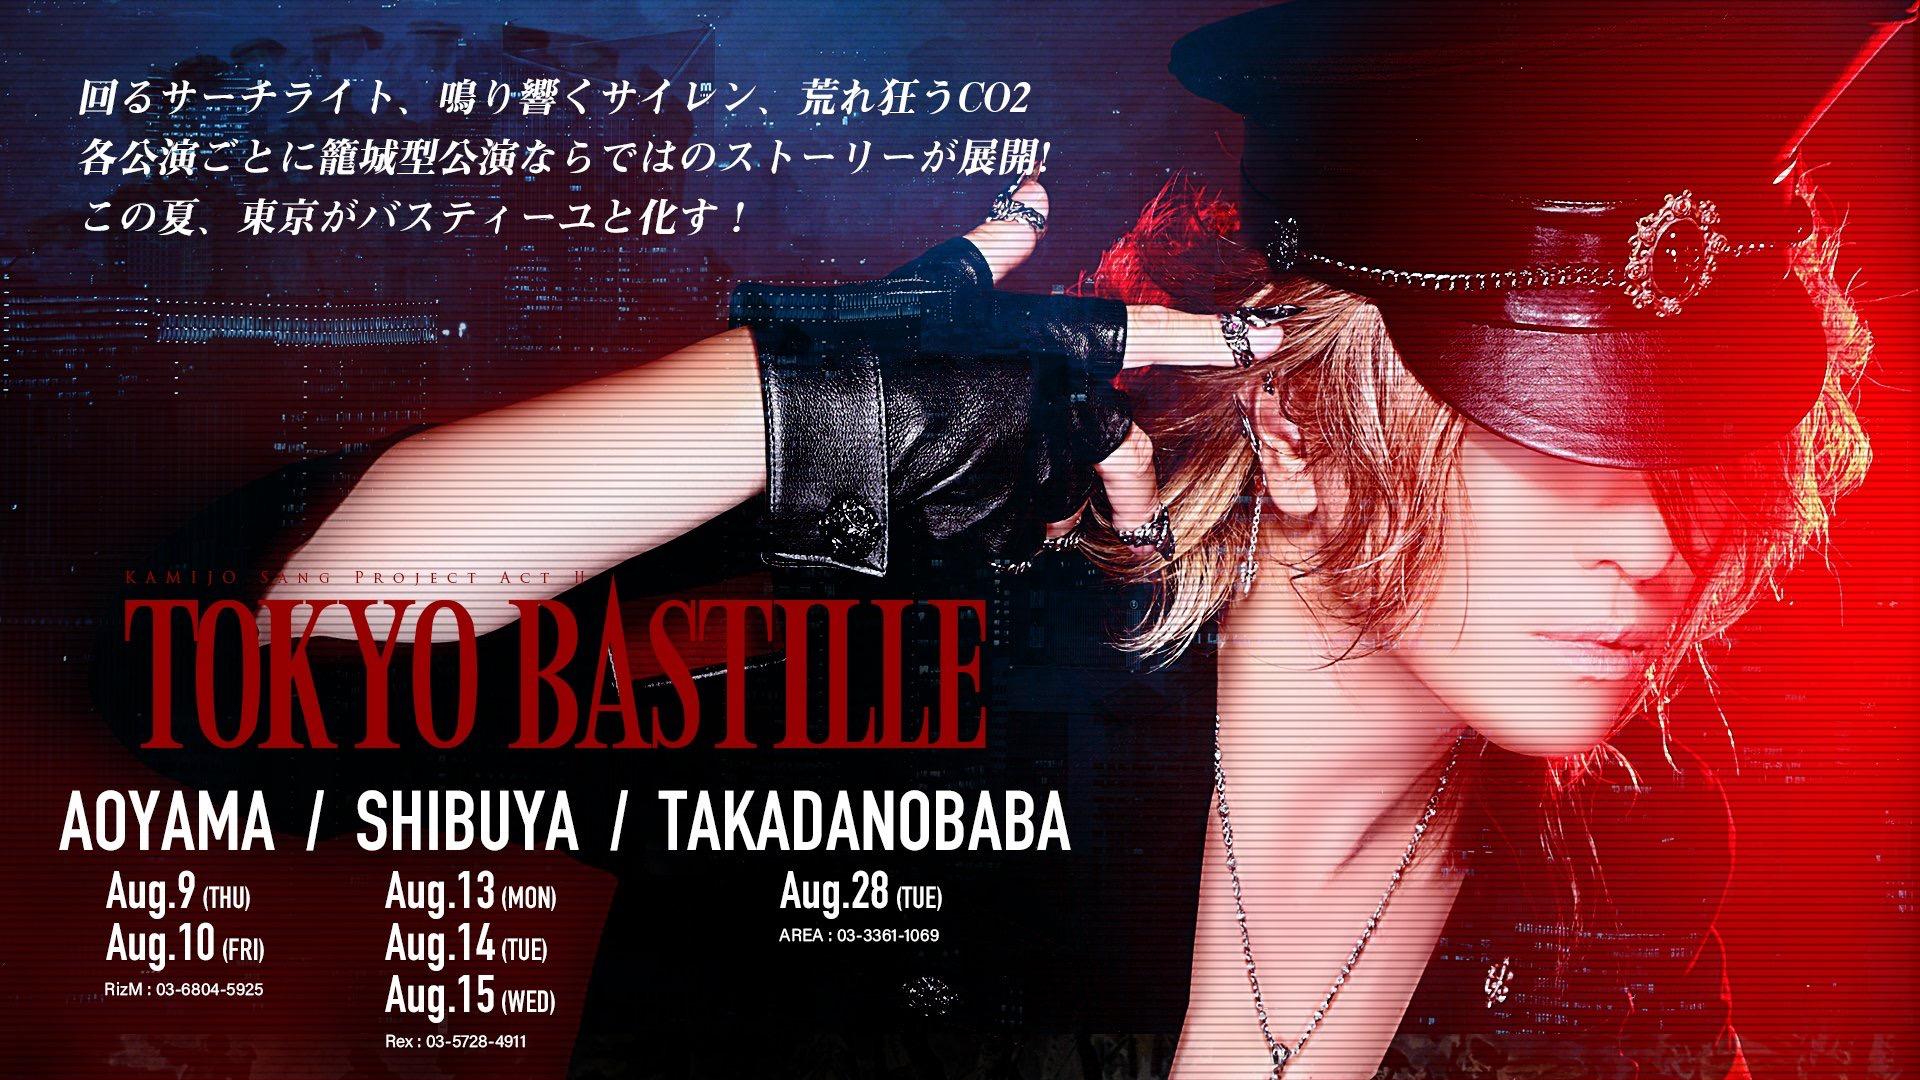 TOKYO BASTILLE